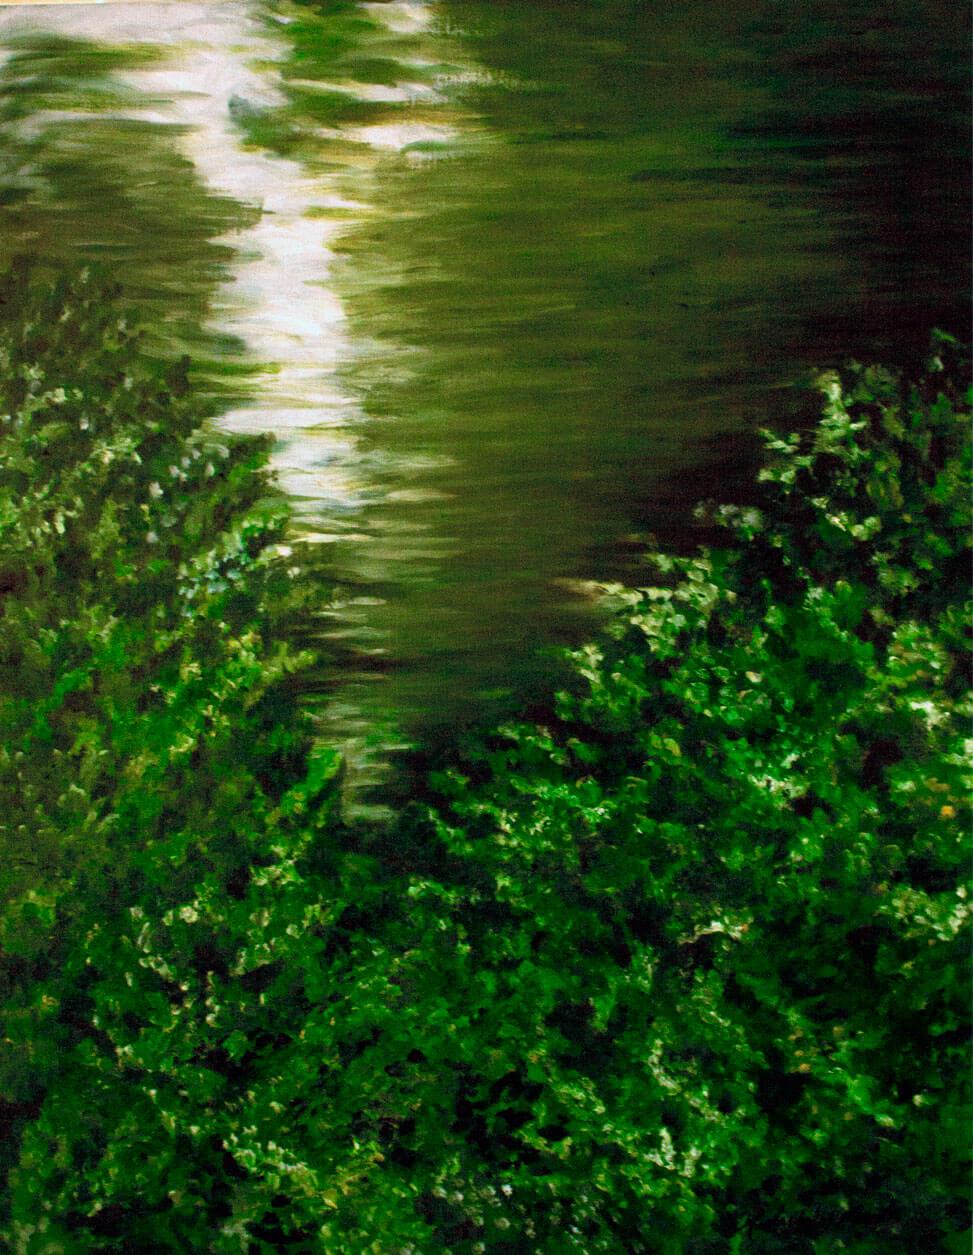 Landscapes, oil on linen, 95 x 70 cm., 2015.